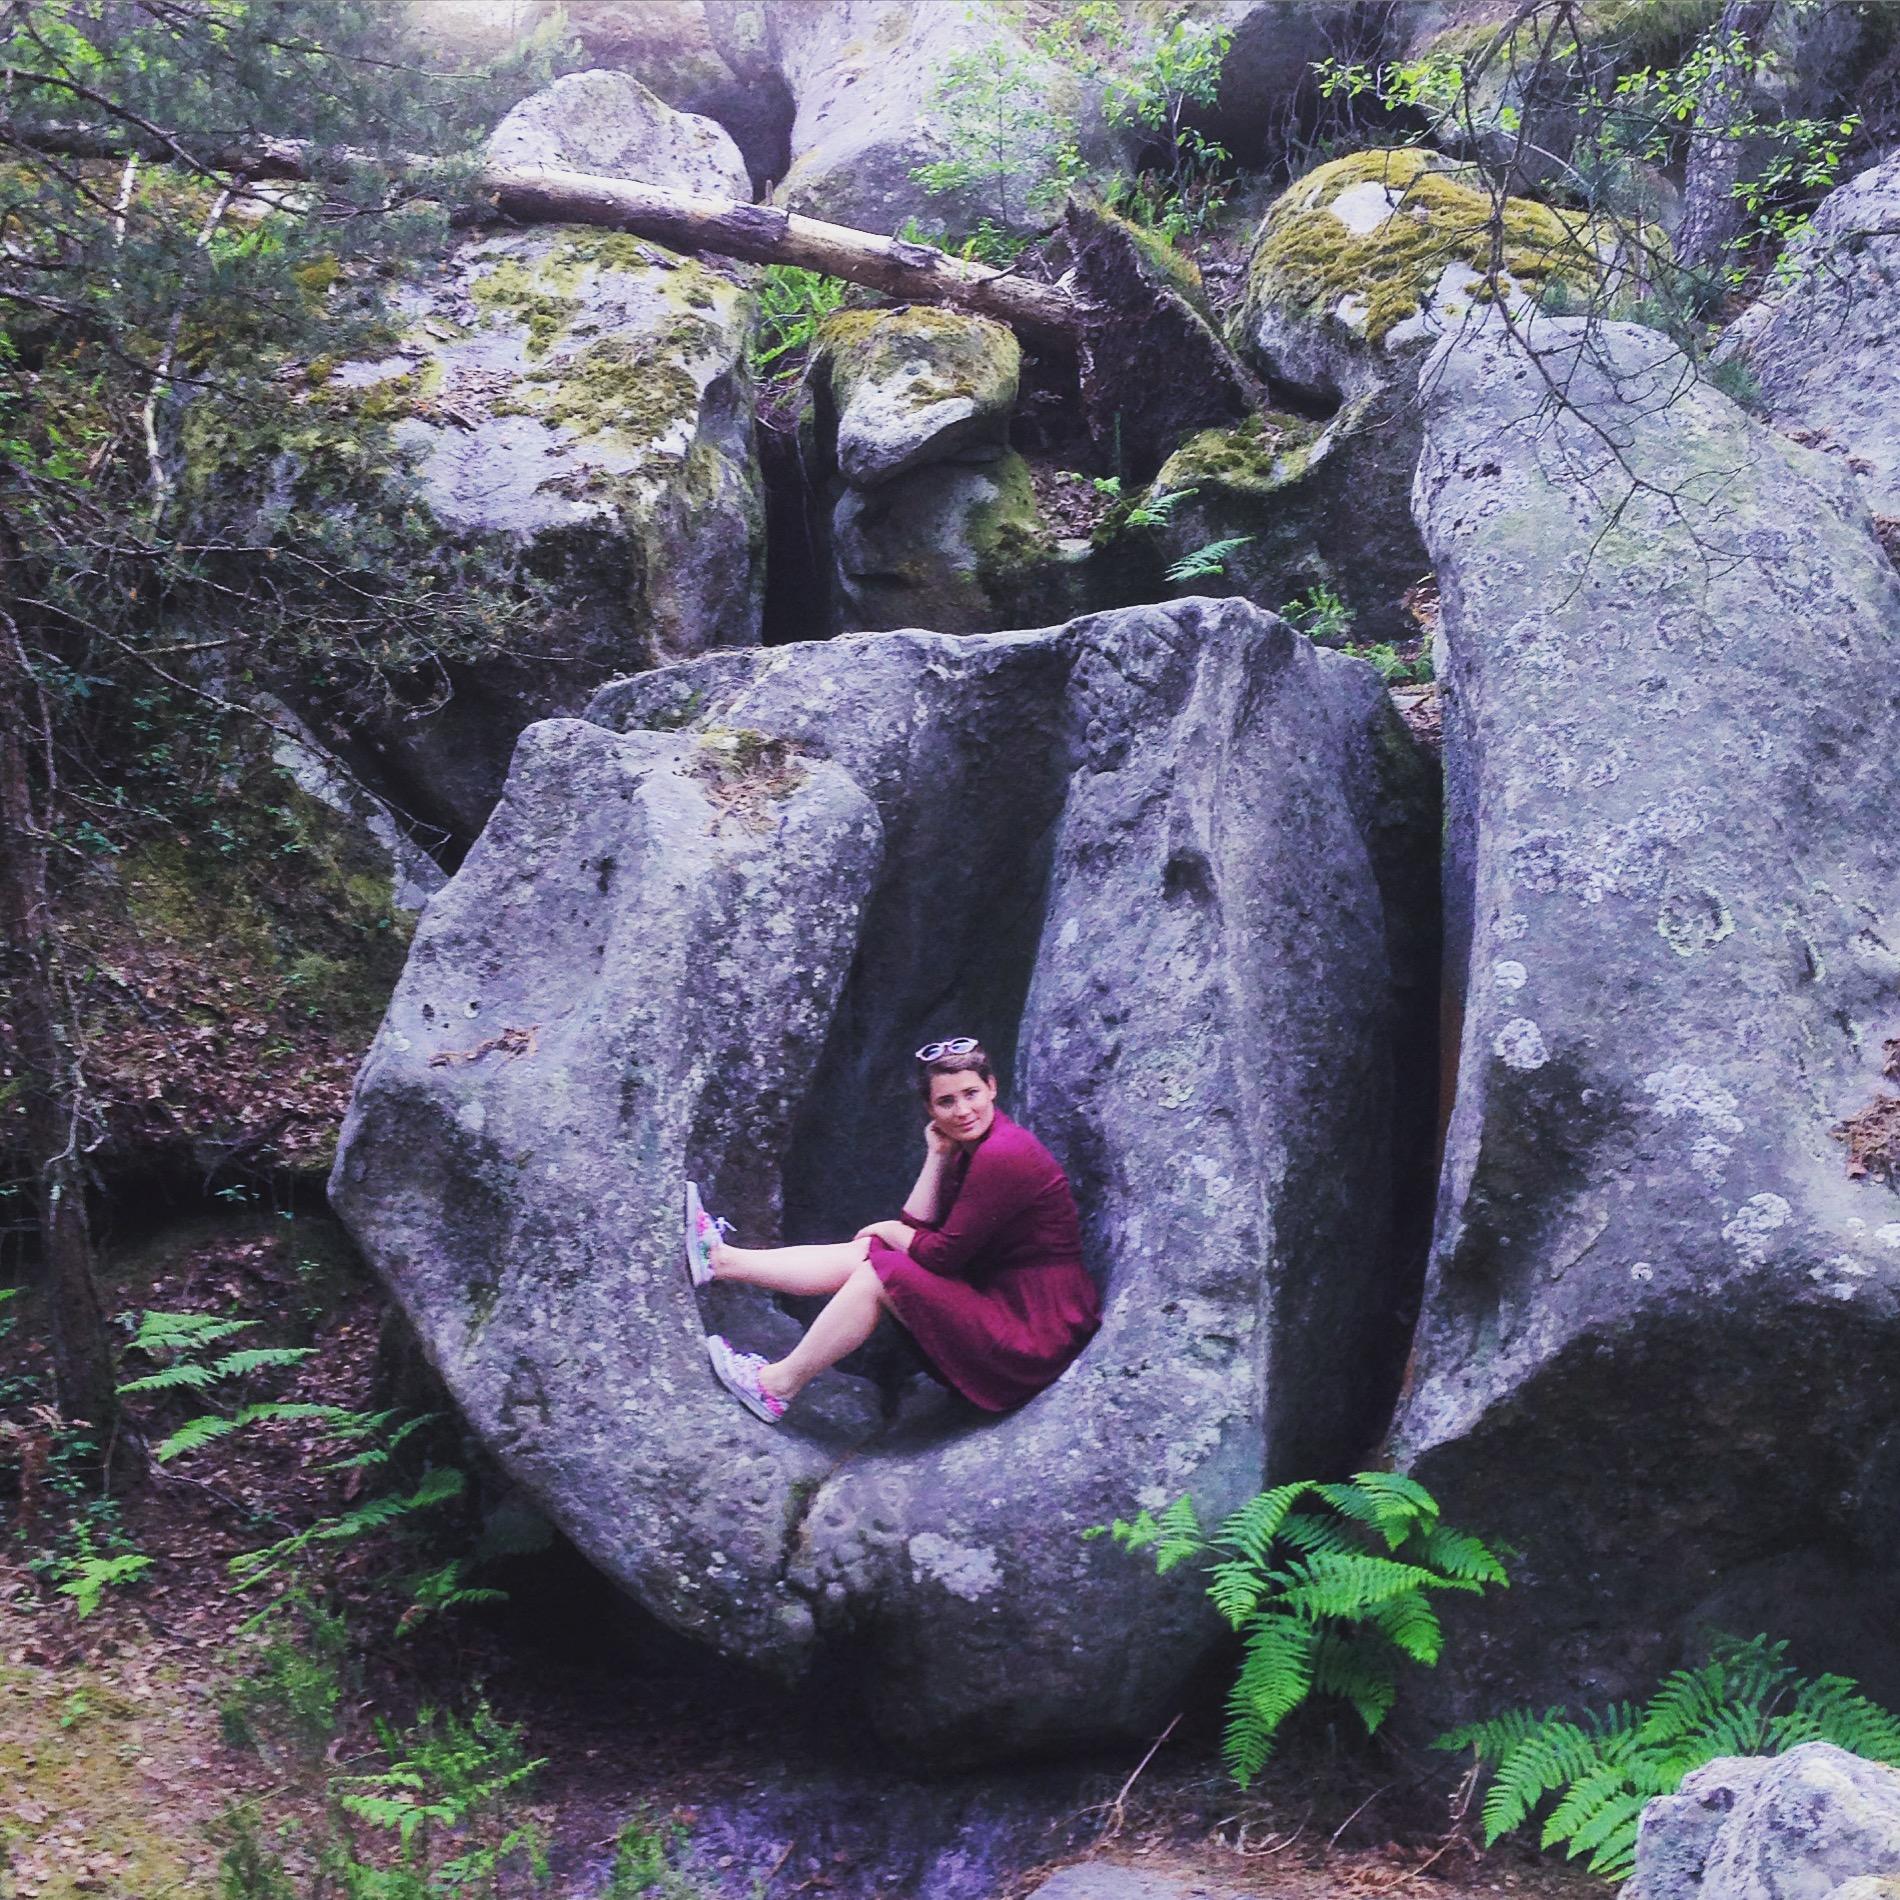 maybeyoulike_Fontainebleau_bouldering27